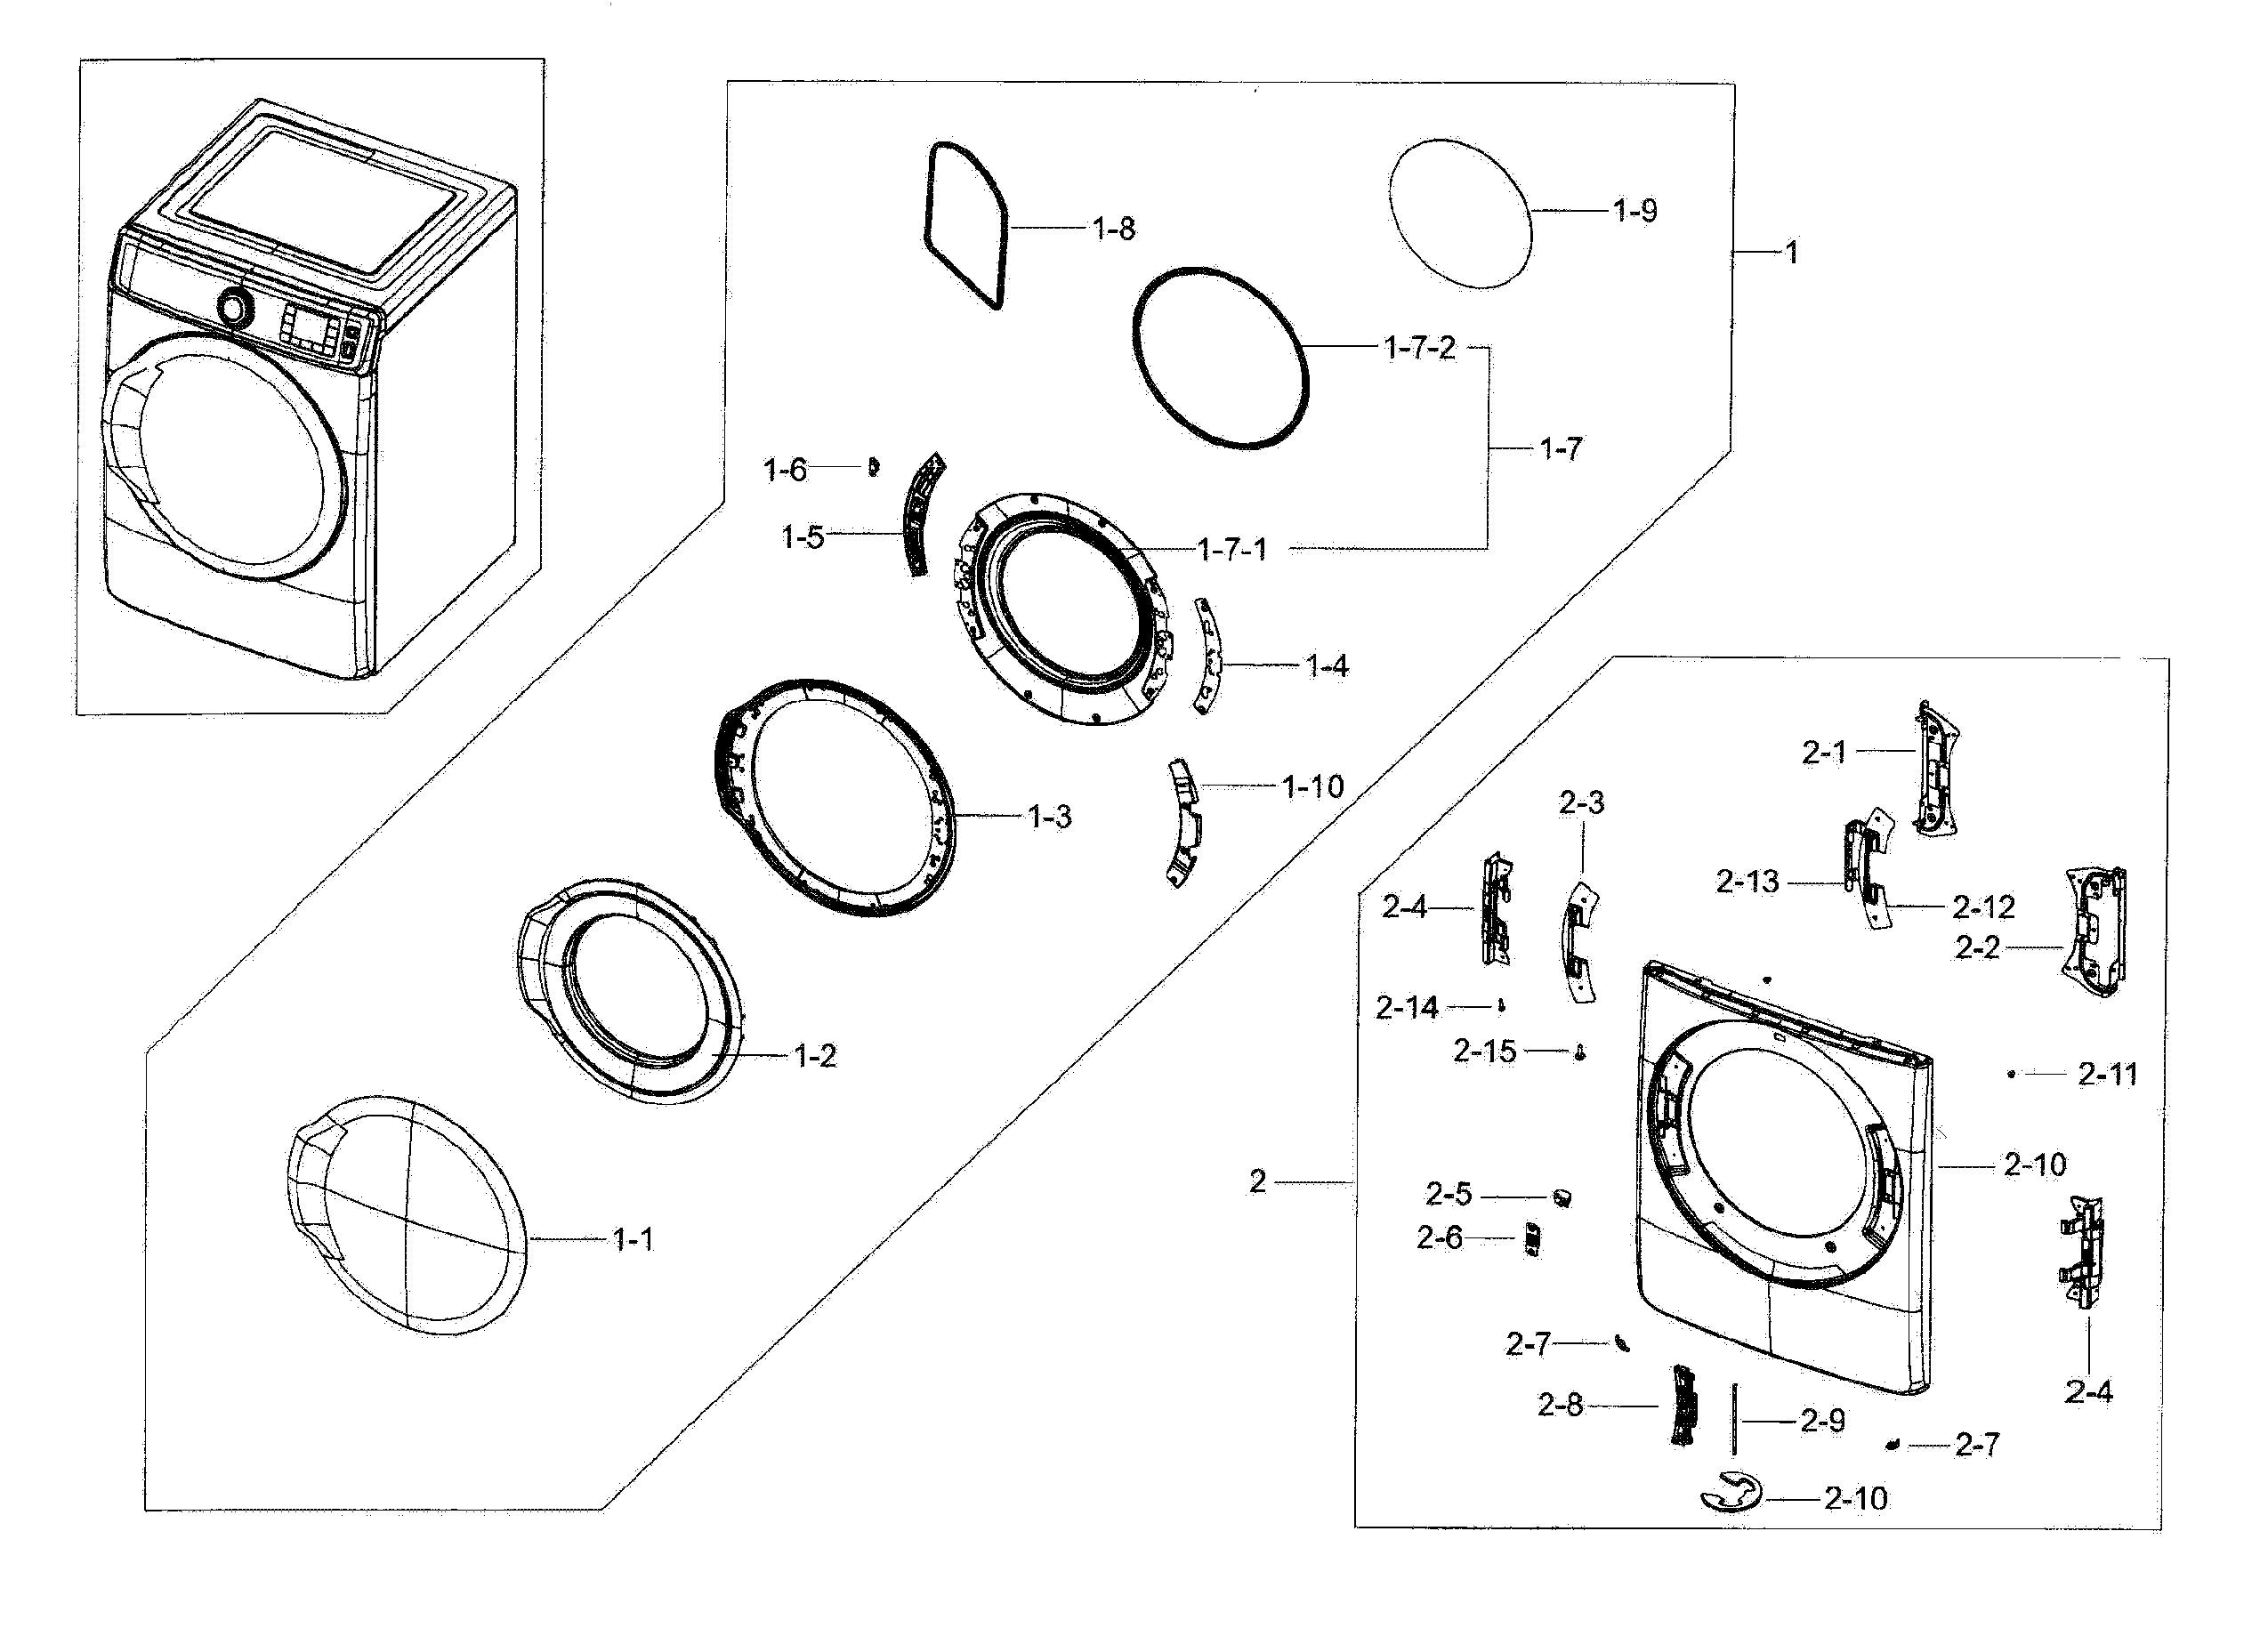 Dyson Animal Parts Diagram Samsung Model Dv56h9100eg A2